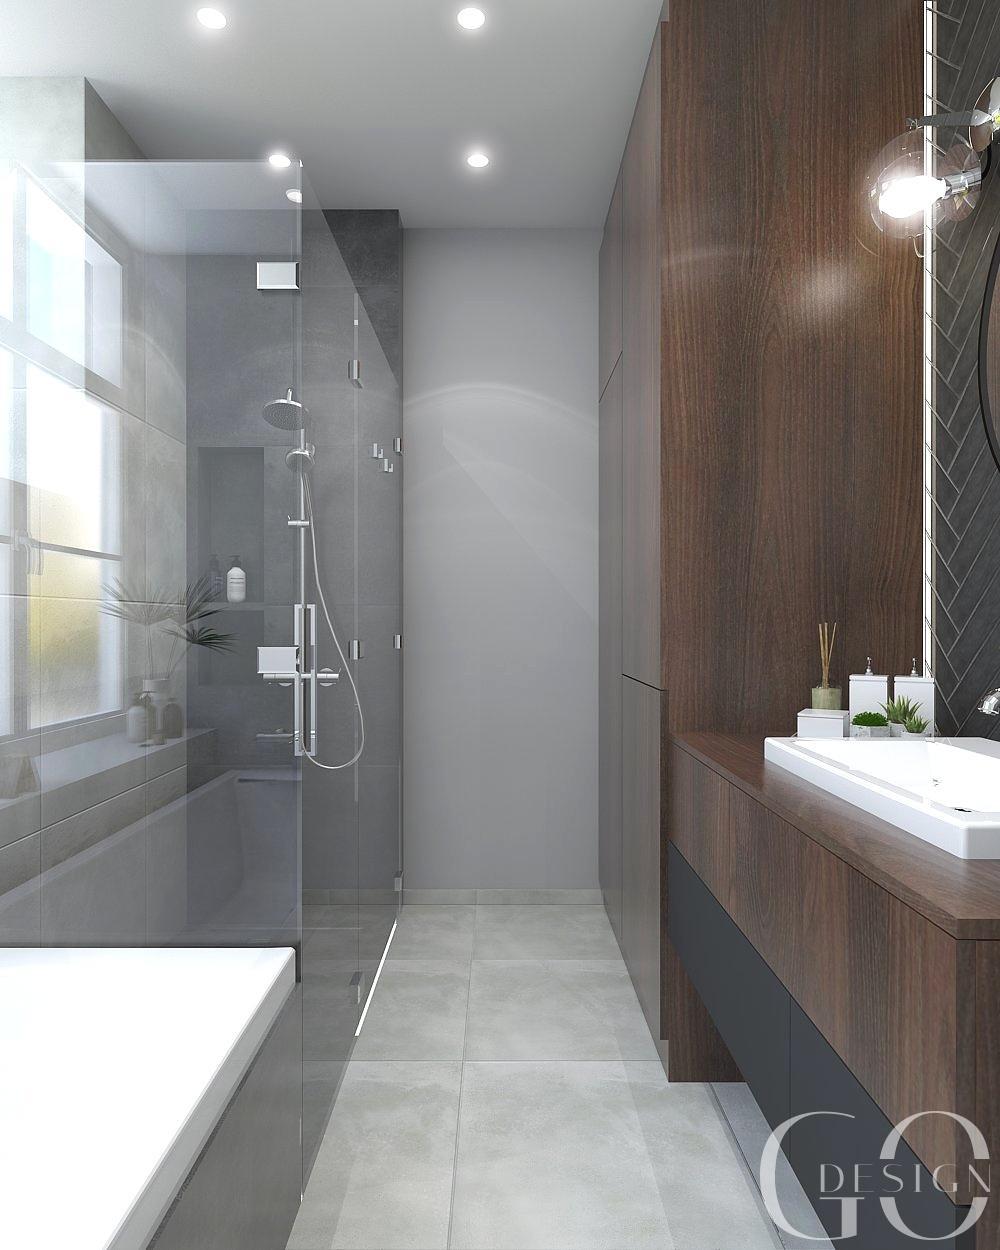 Návrh staromestského bytu v loftovom štýle - Rožňava - Obrázok č. 9